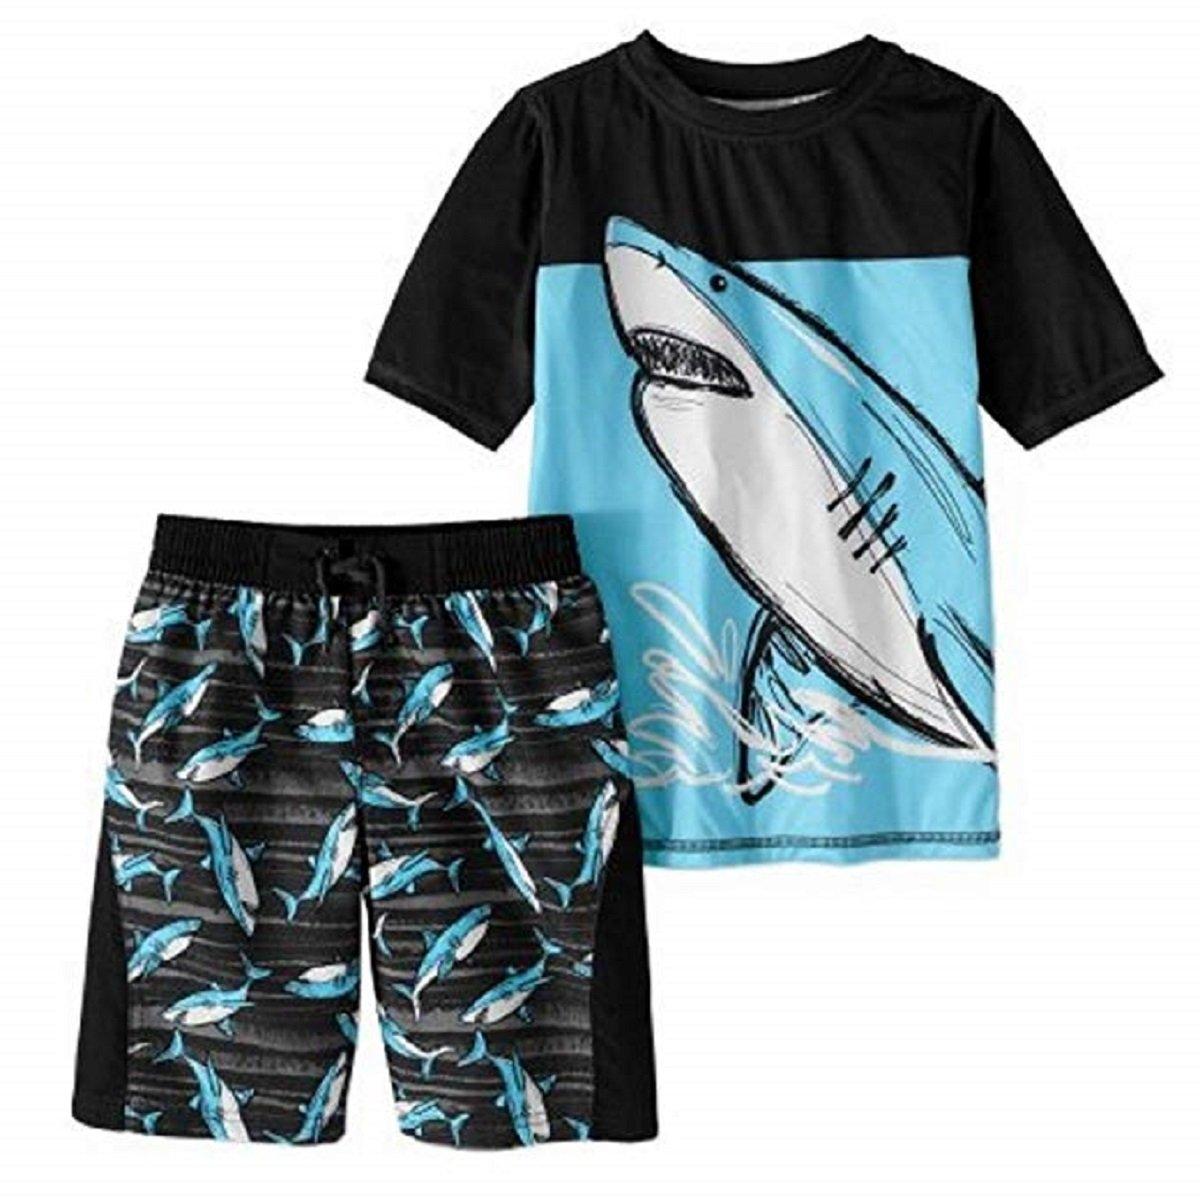 Boy's 2 Piece Rashguard Swim Set (X-Large 14/16, Blue Shark)